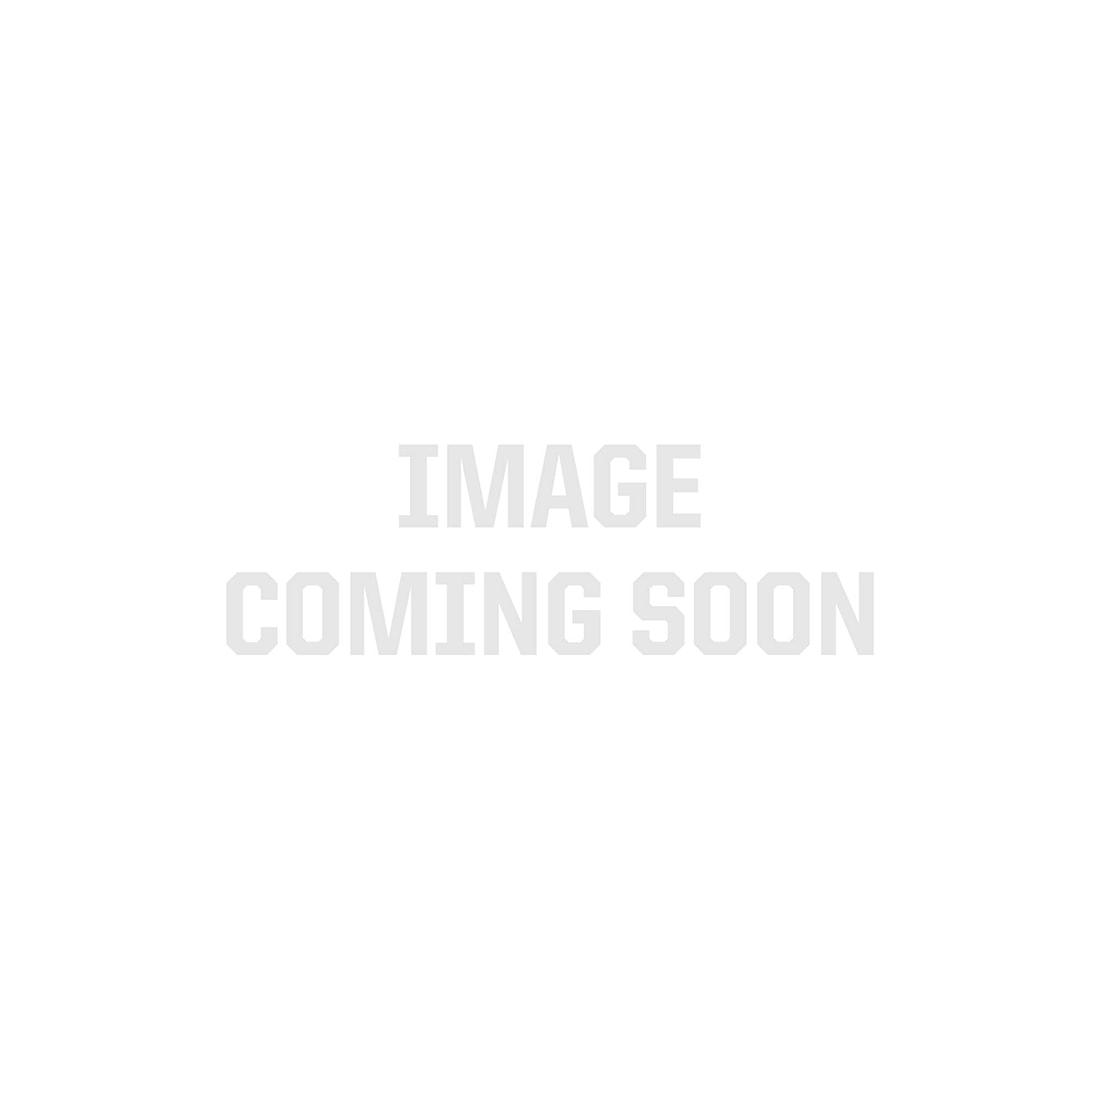 Neutral White 5630 Single Row CurrentControl LED Strip Light, 70/m, 5.1mm wide, Sample Kit